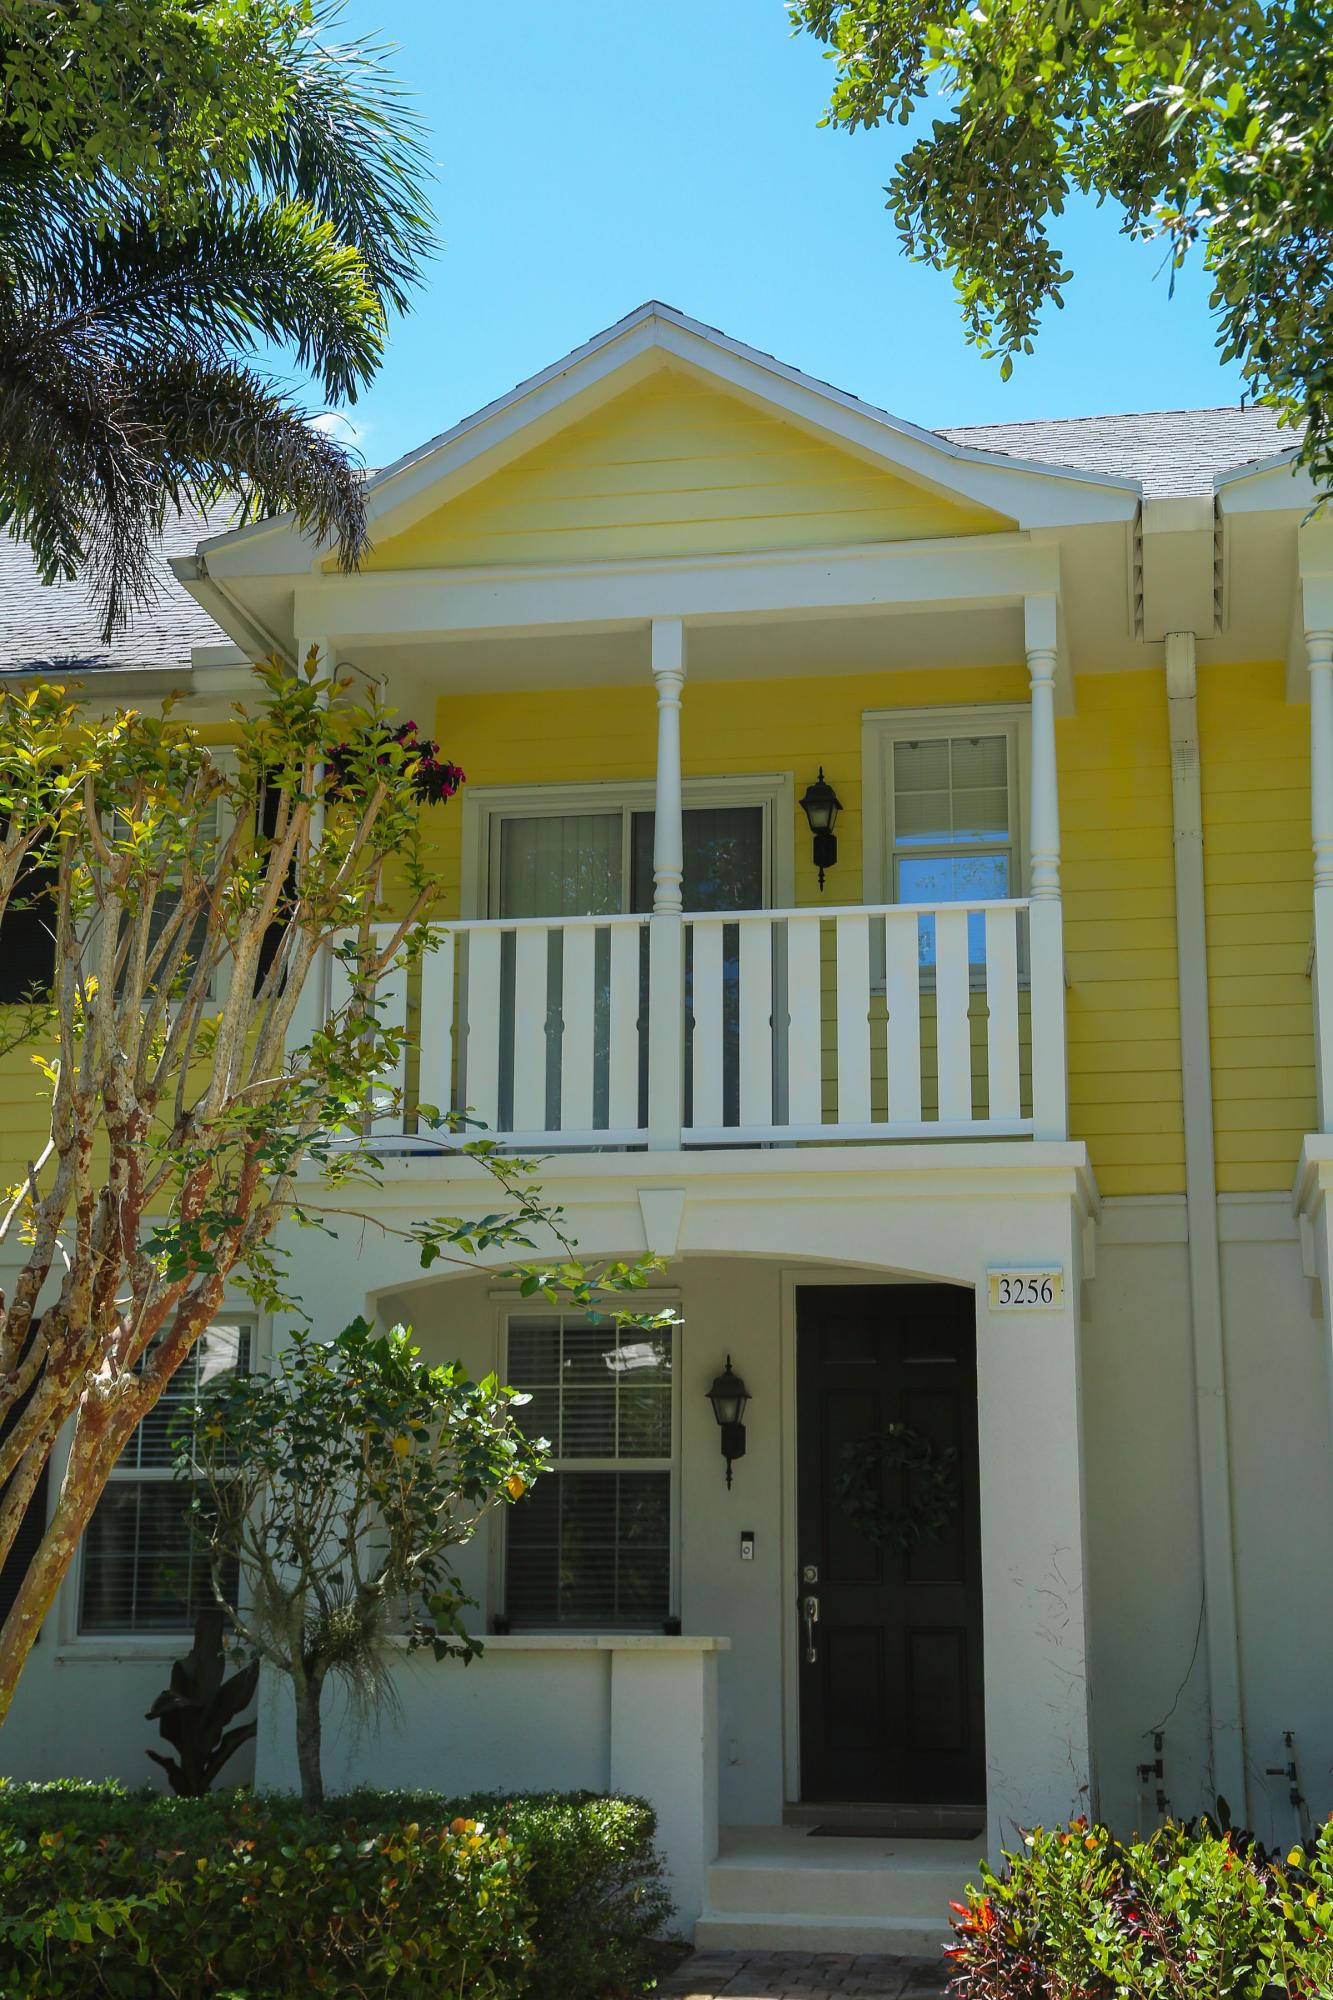 3256 Community Drive, Jupiter, Florida 33458, 3 Bedrooms Bedrooms, ,2.1 BathroomsBathrooms,A,Townhouse,Community,RX-10522599